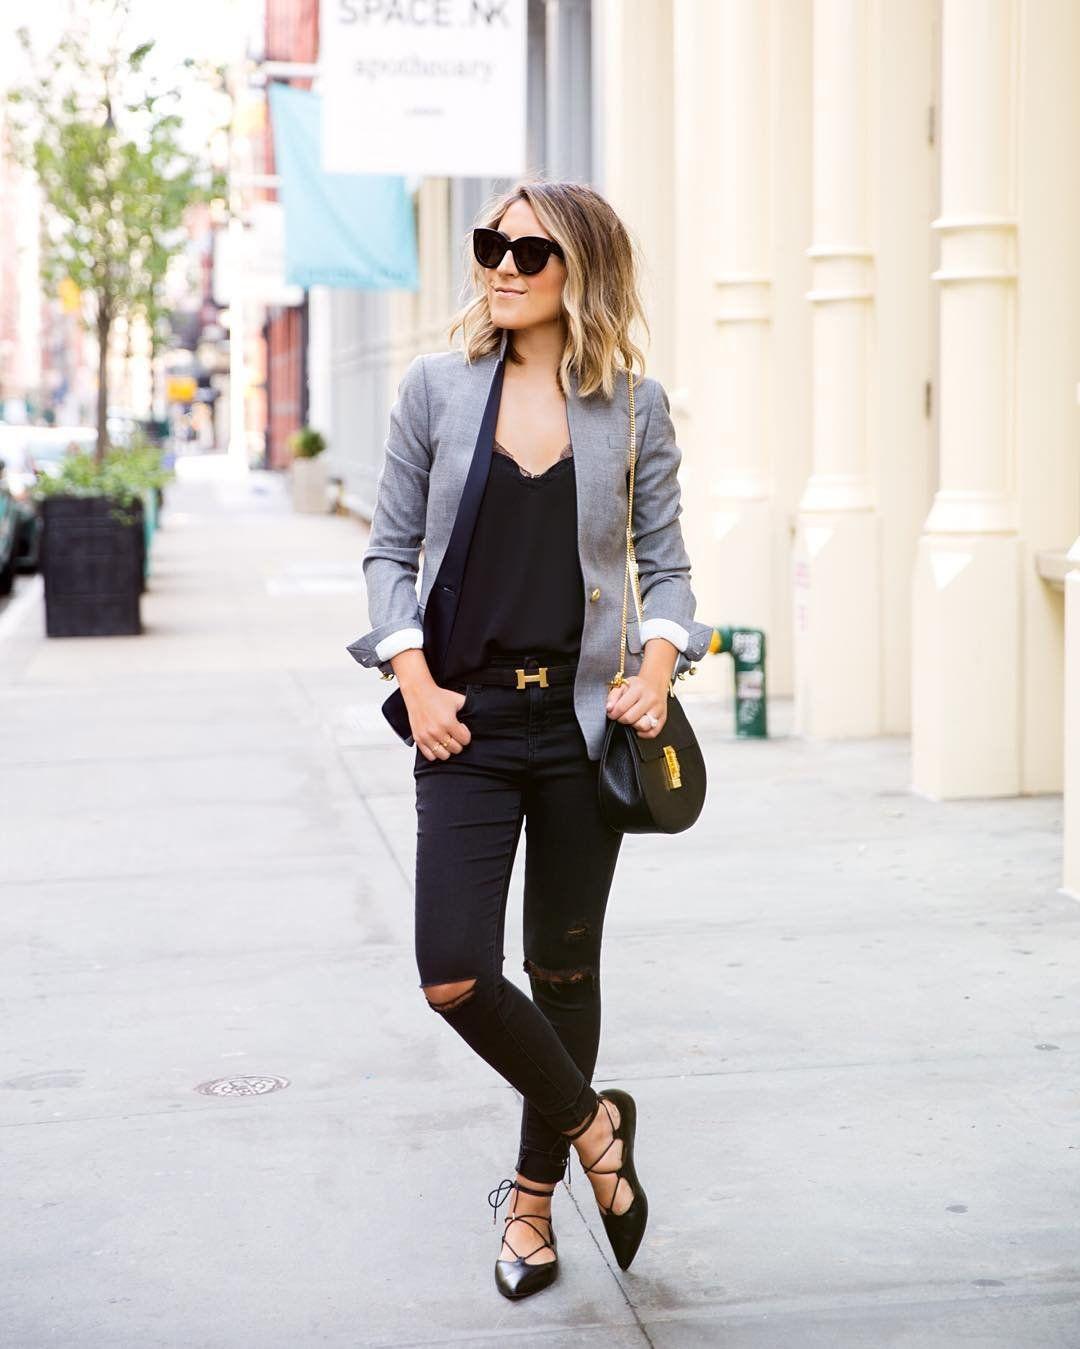 A Gray Blazer a Black TShirt Black Jeans and Black Flats